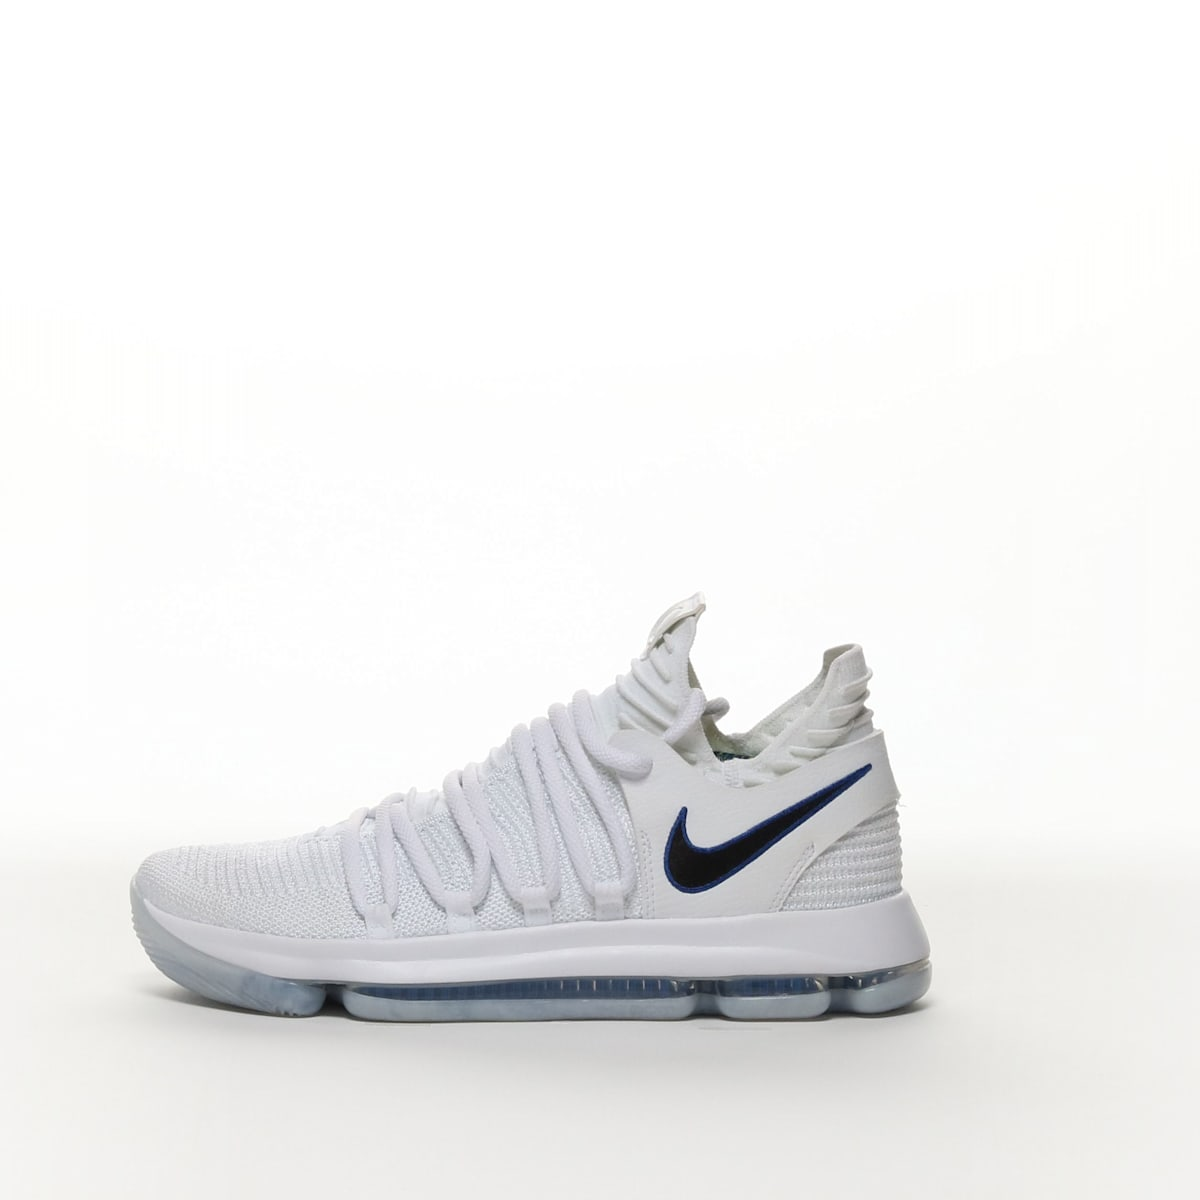 27a7e9f47e0 Nike Zoom KDX - WHITE UNIVERSITY GOLD GAME ROYAL – Resku